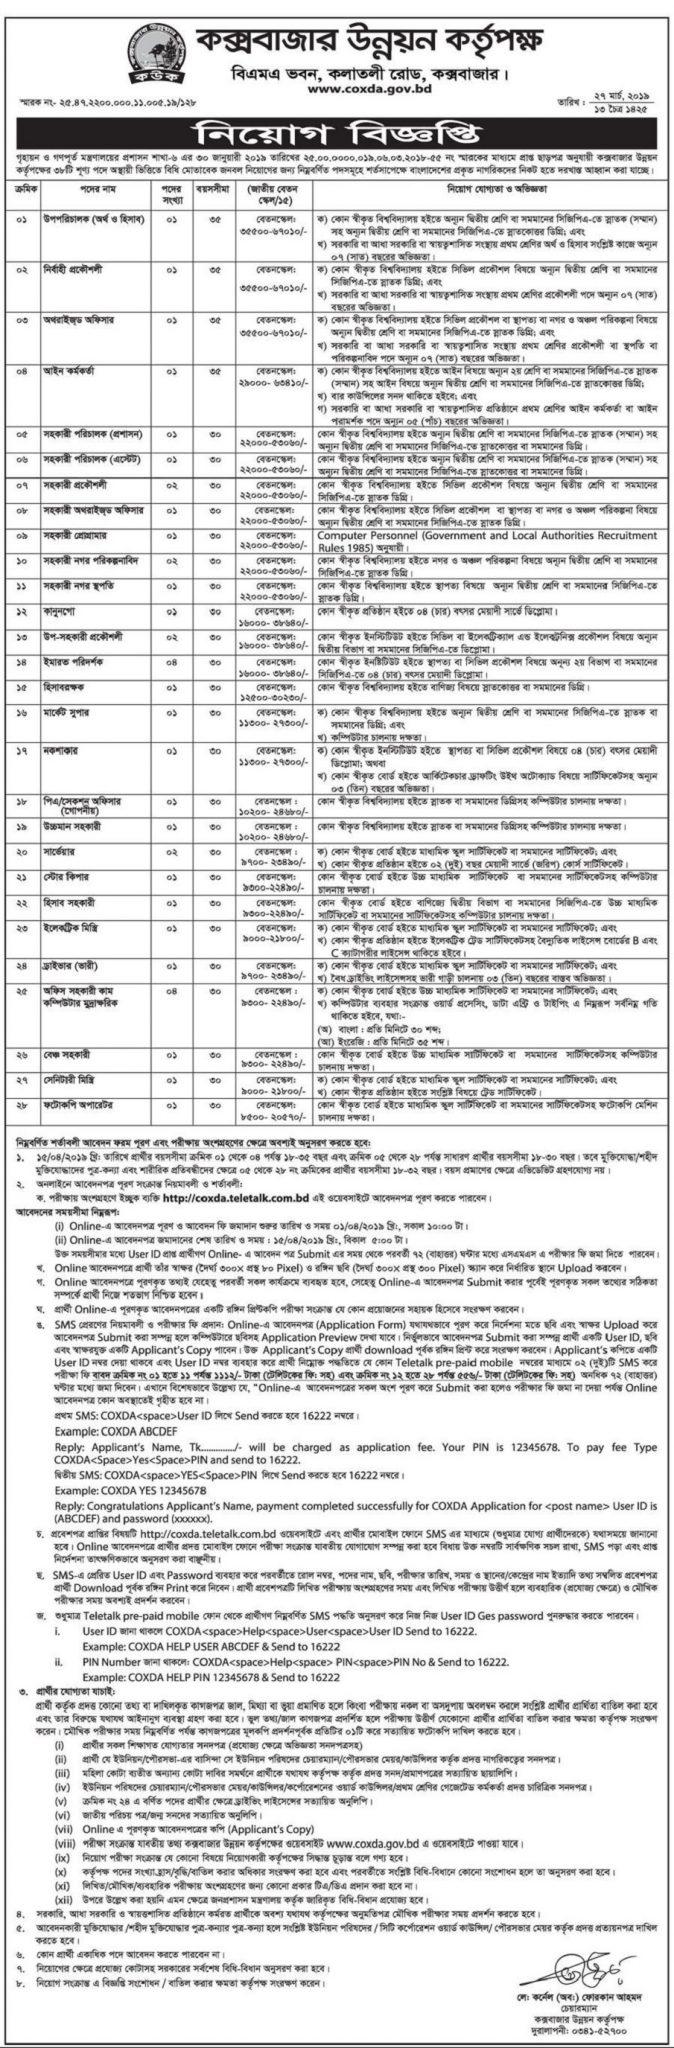 Coxsbazar Development Authority Job Circular 2019